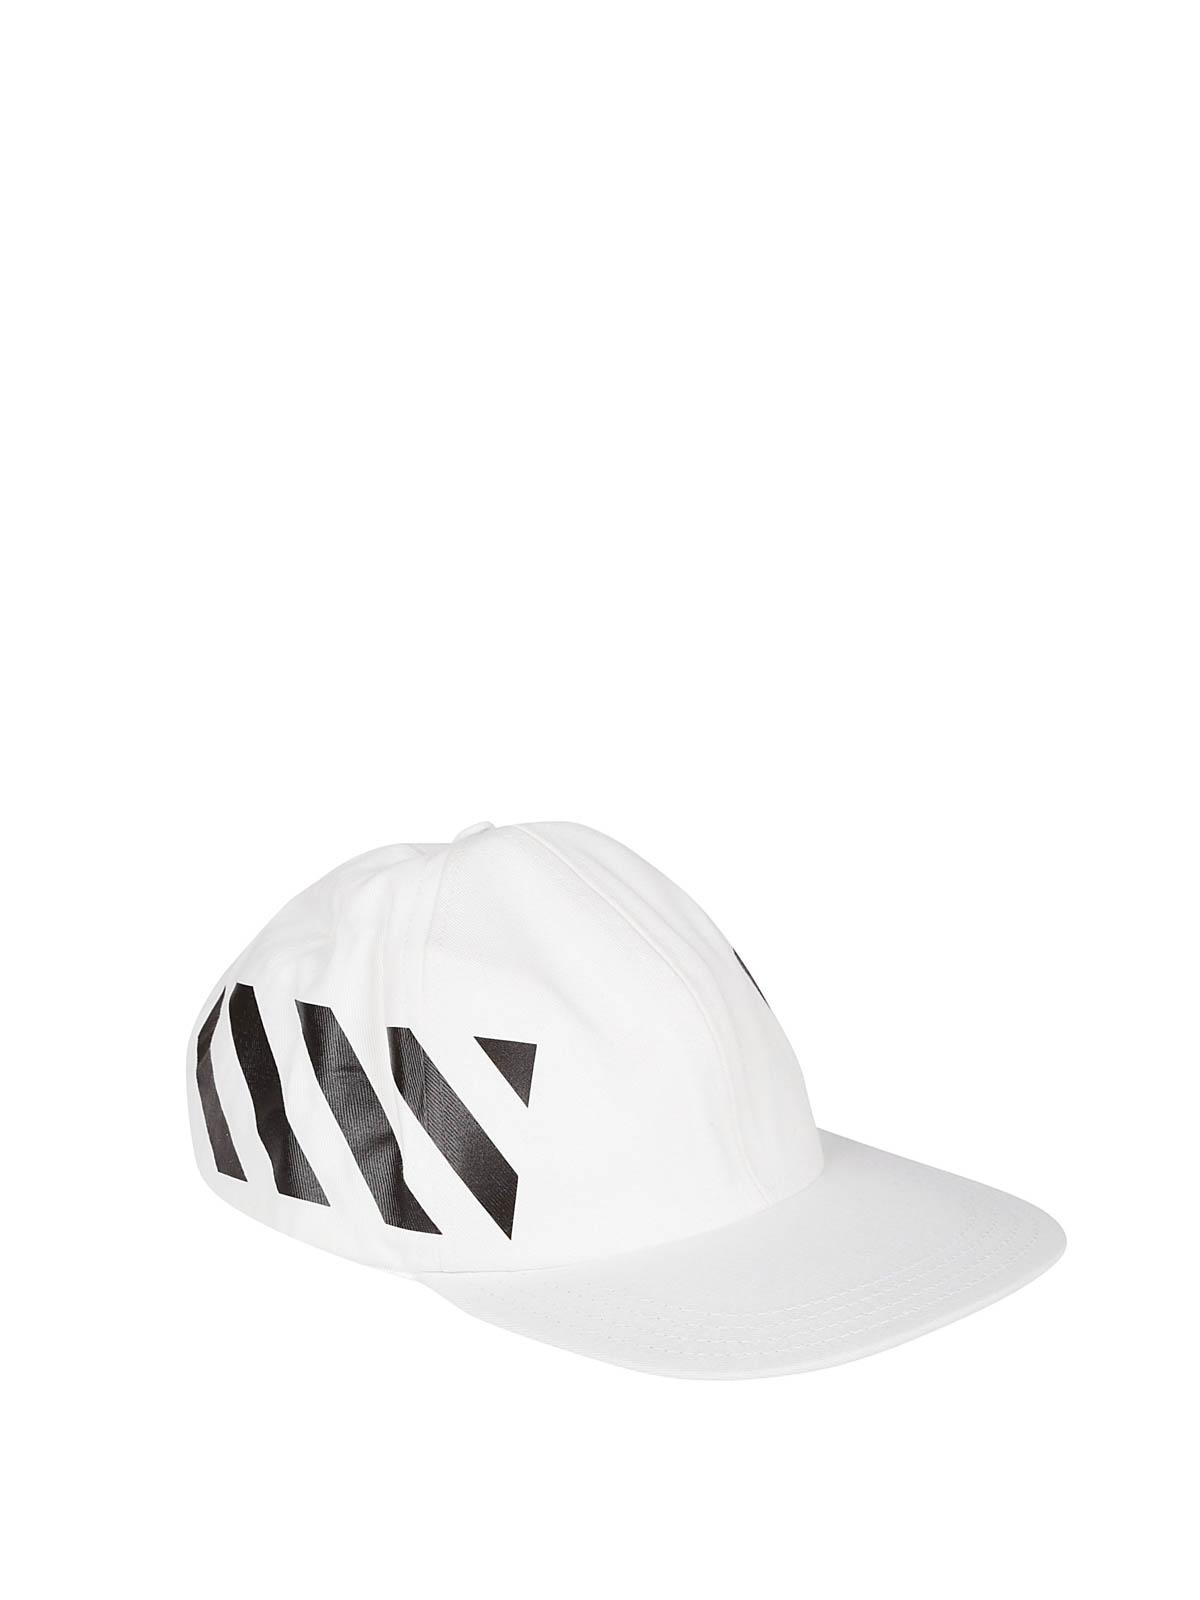 a9620eea1 Off-White - Diag white baseball cap - hats & caps - OMLB008R194000320210